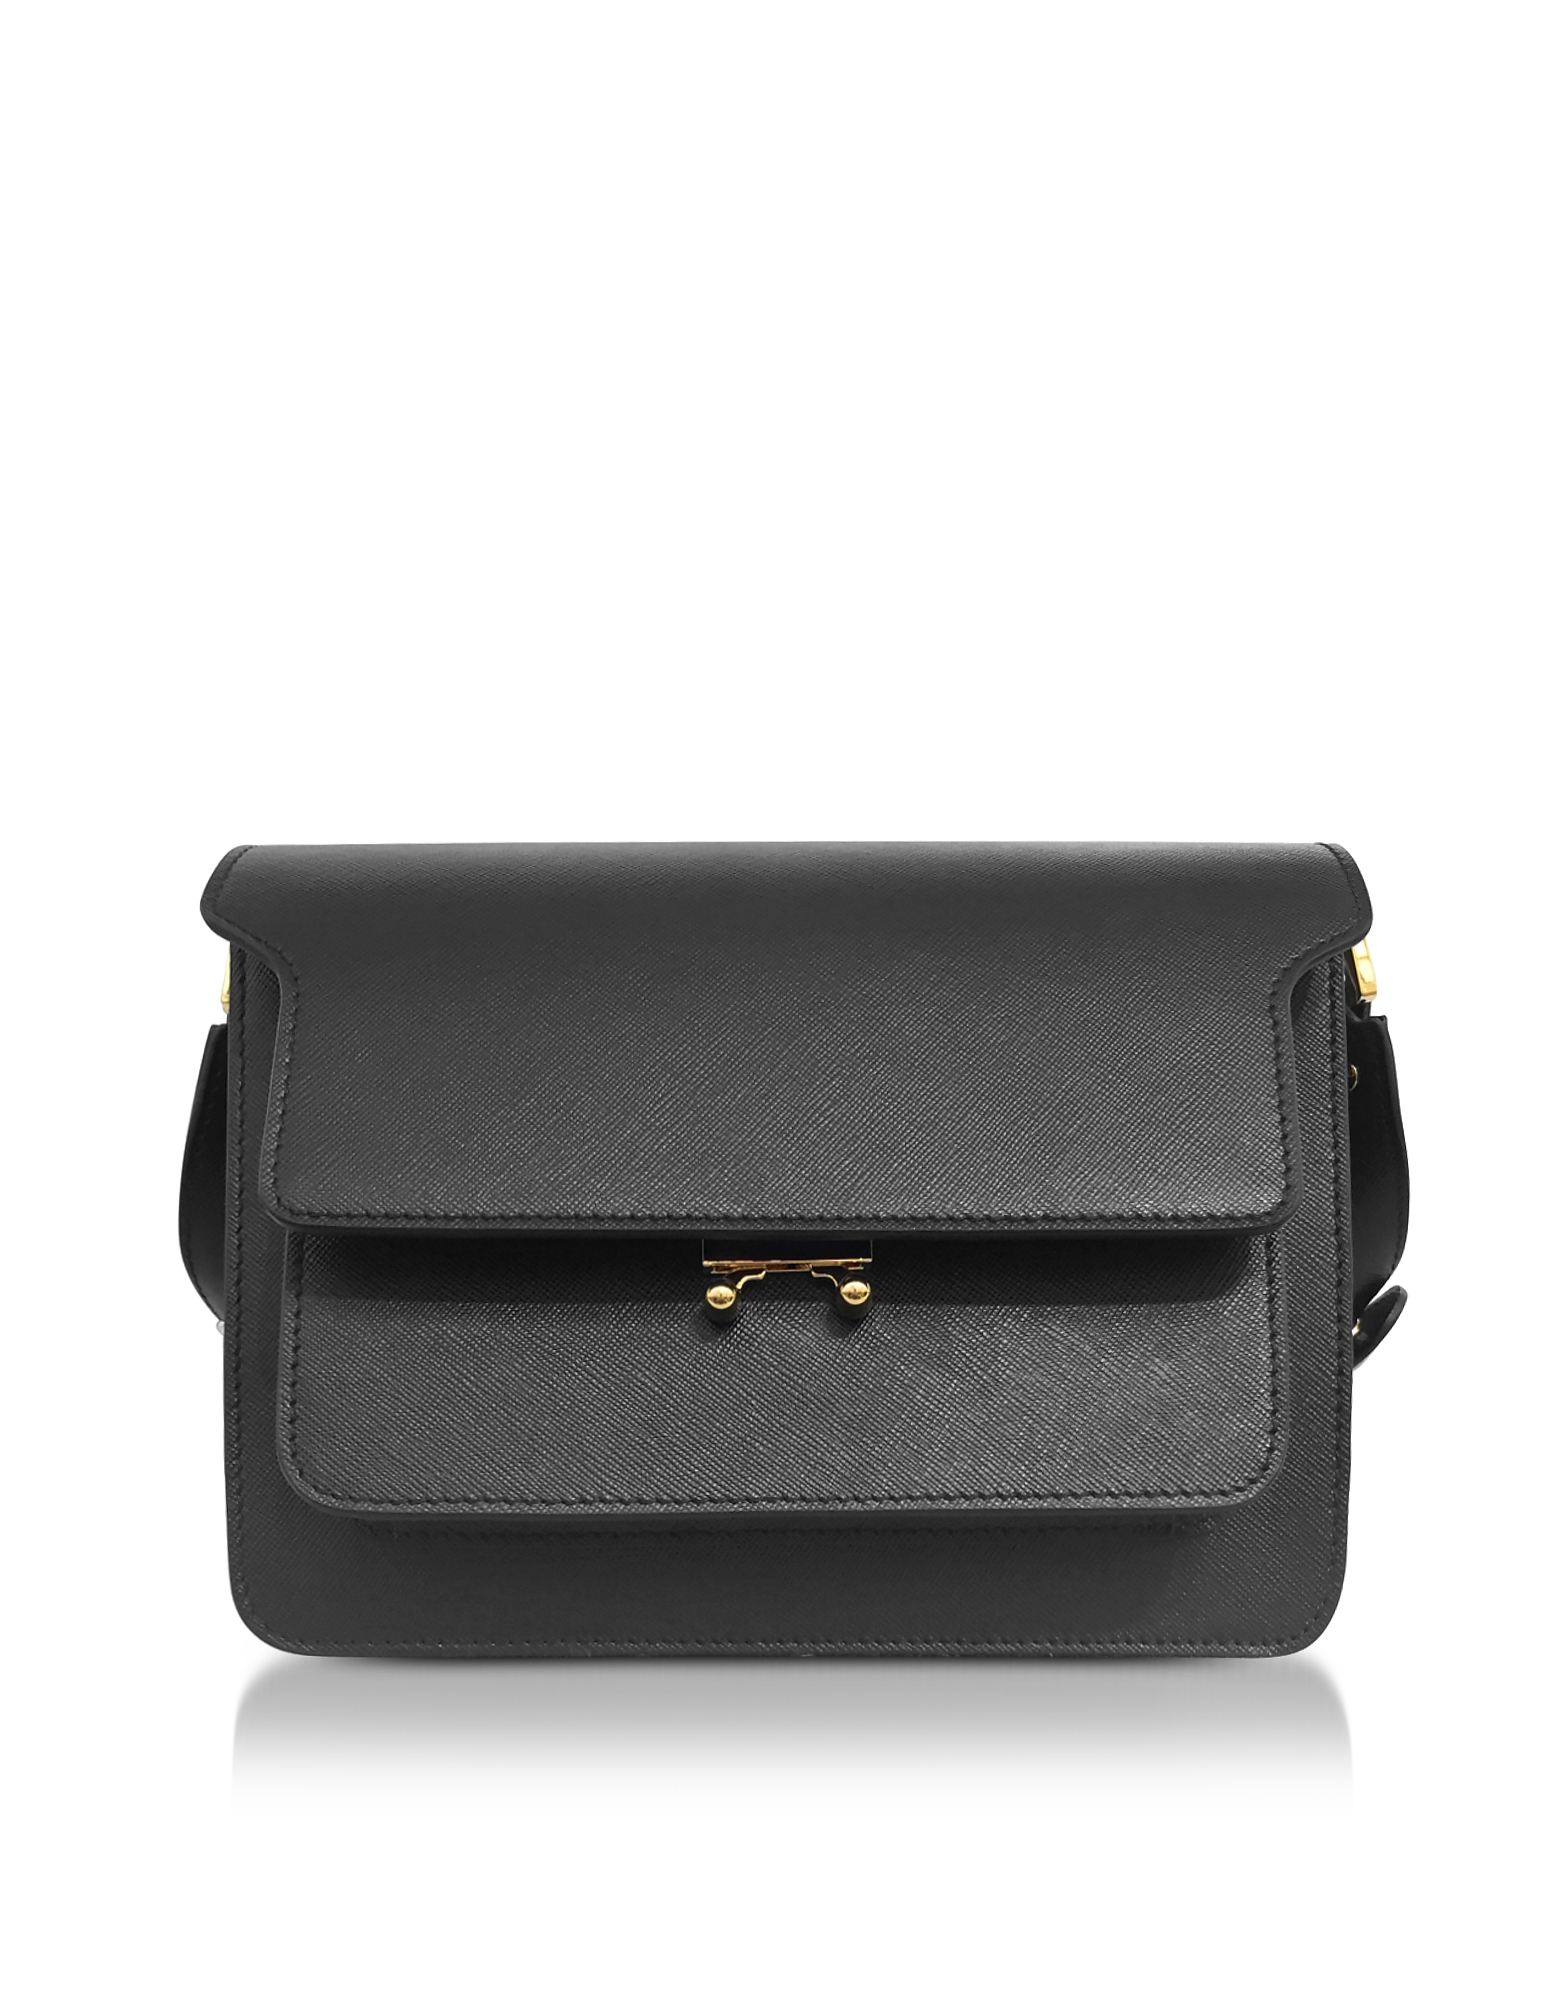 Black Saffiano Leather Trunk Bag